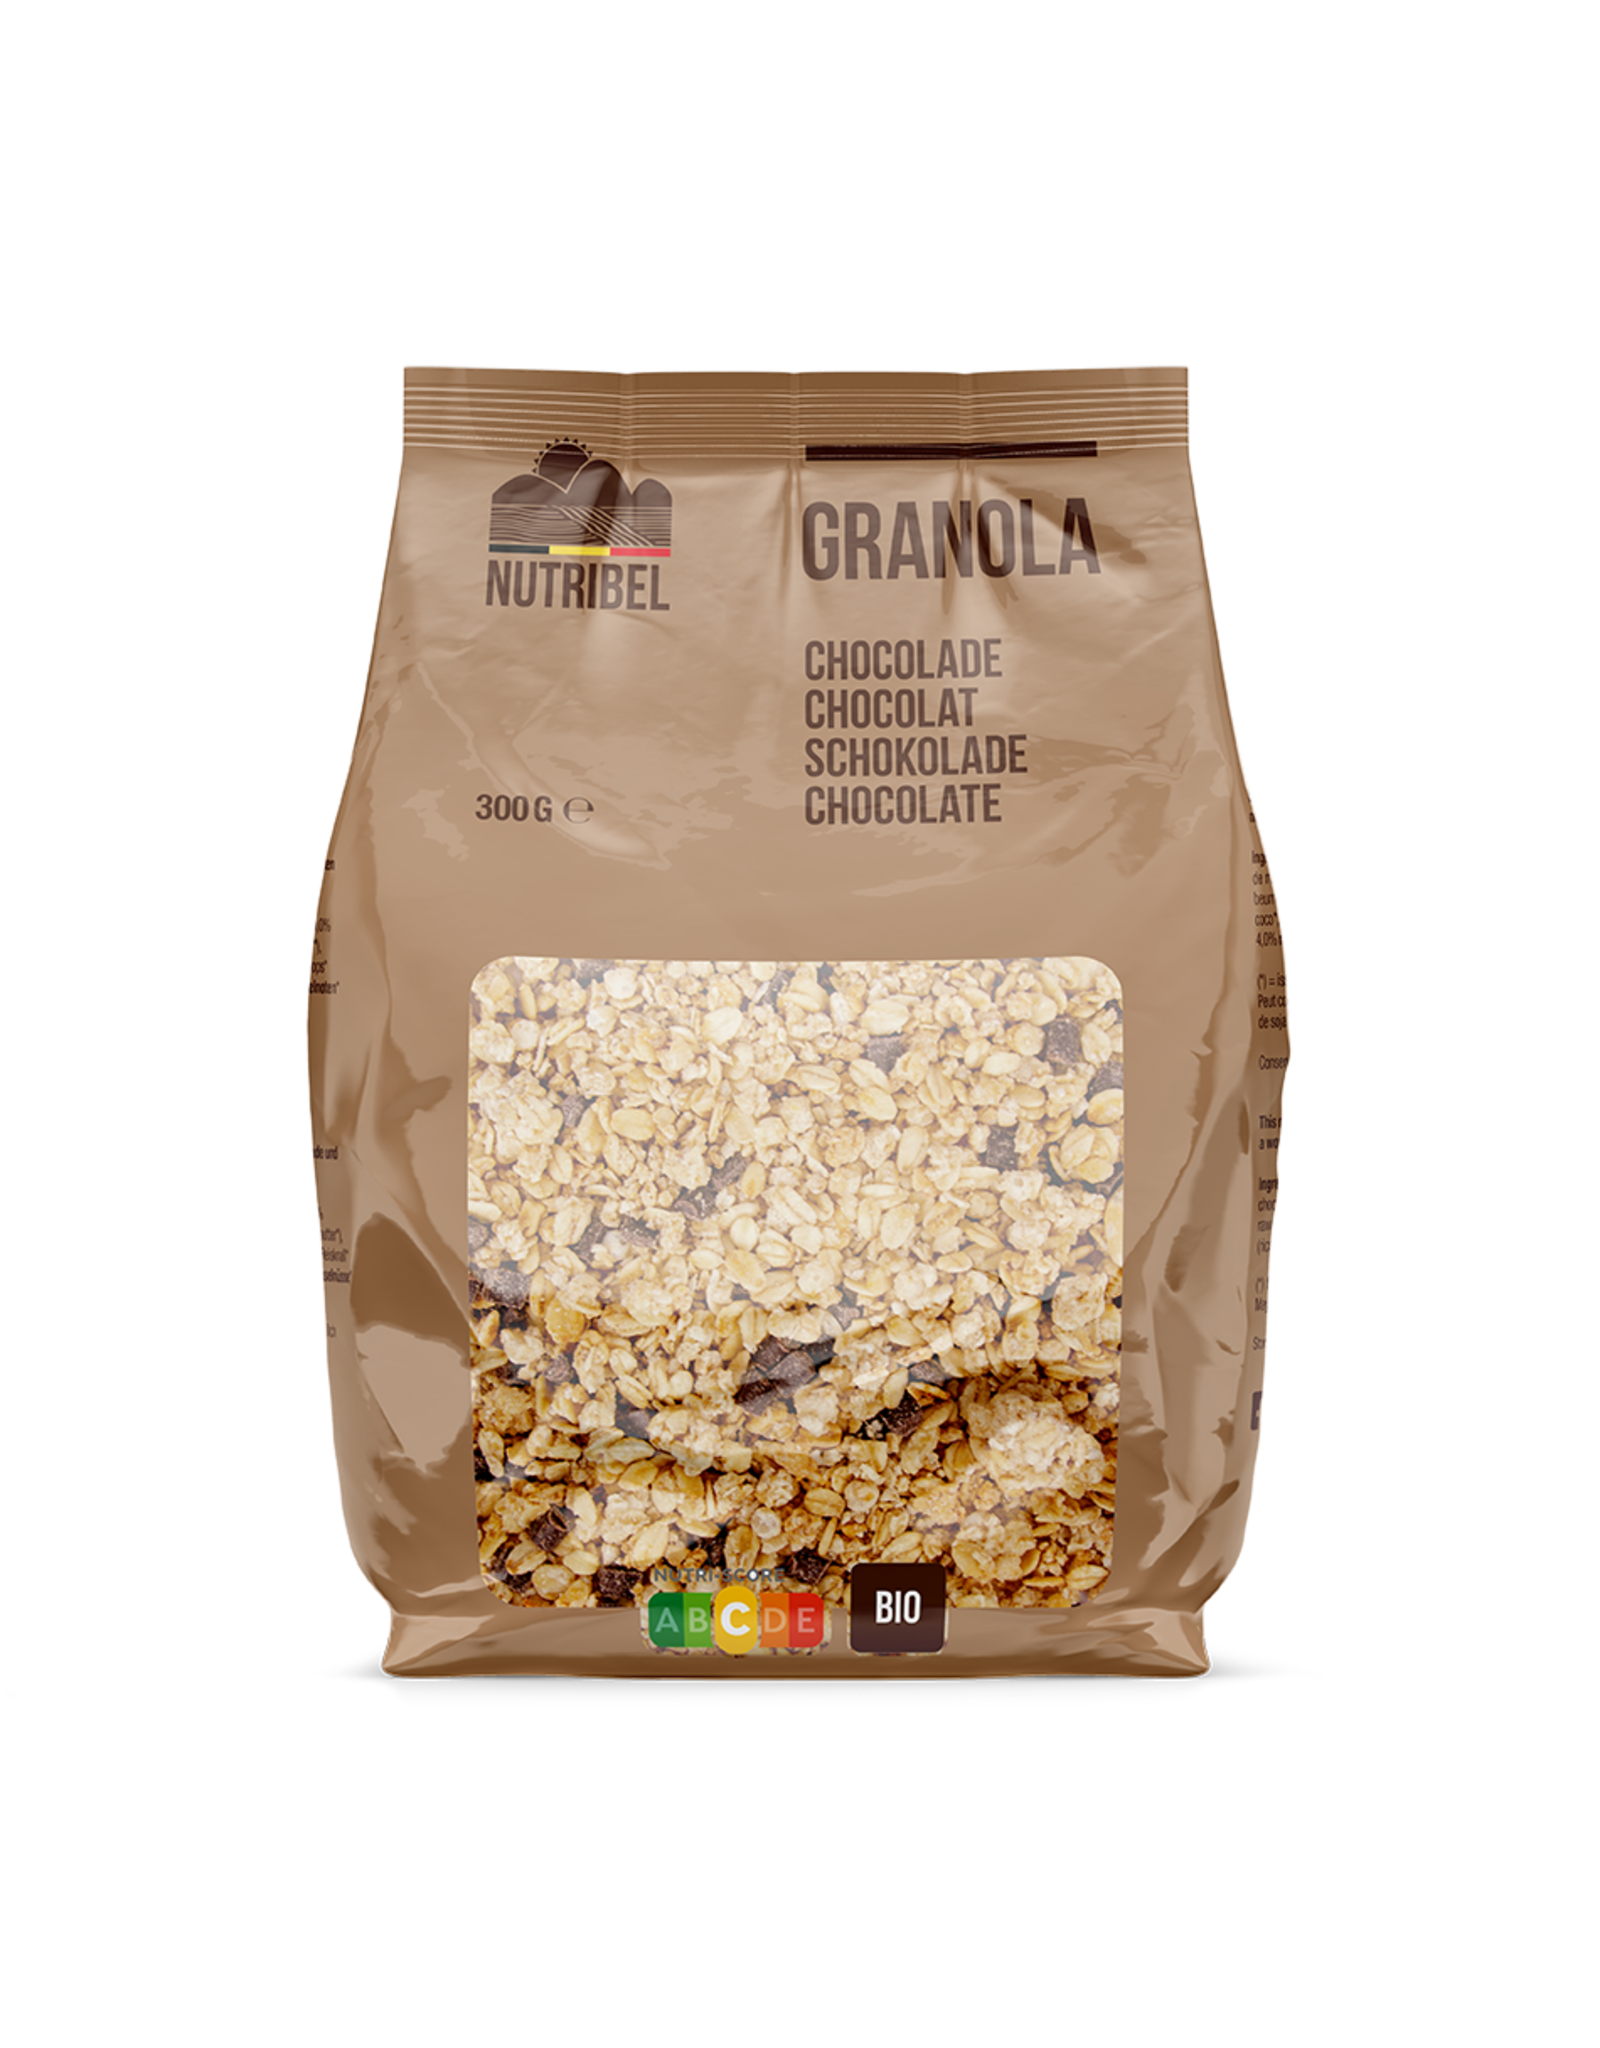 Nutribel Granola chocolade bio 300g